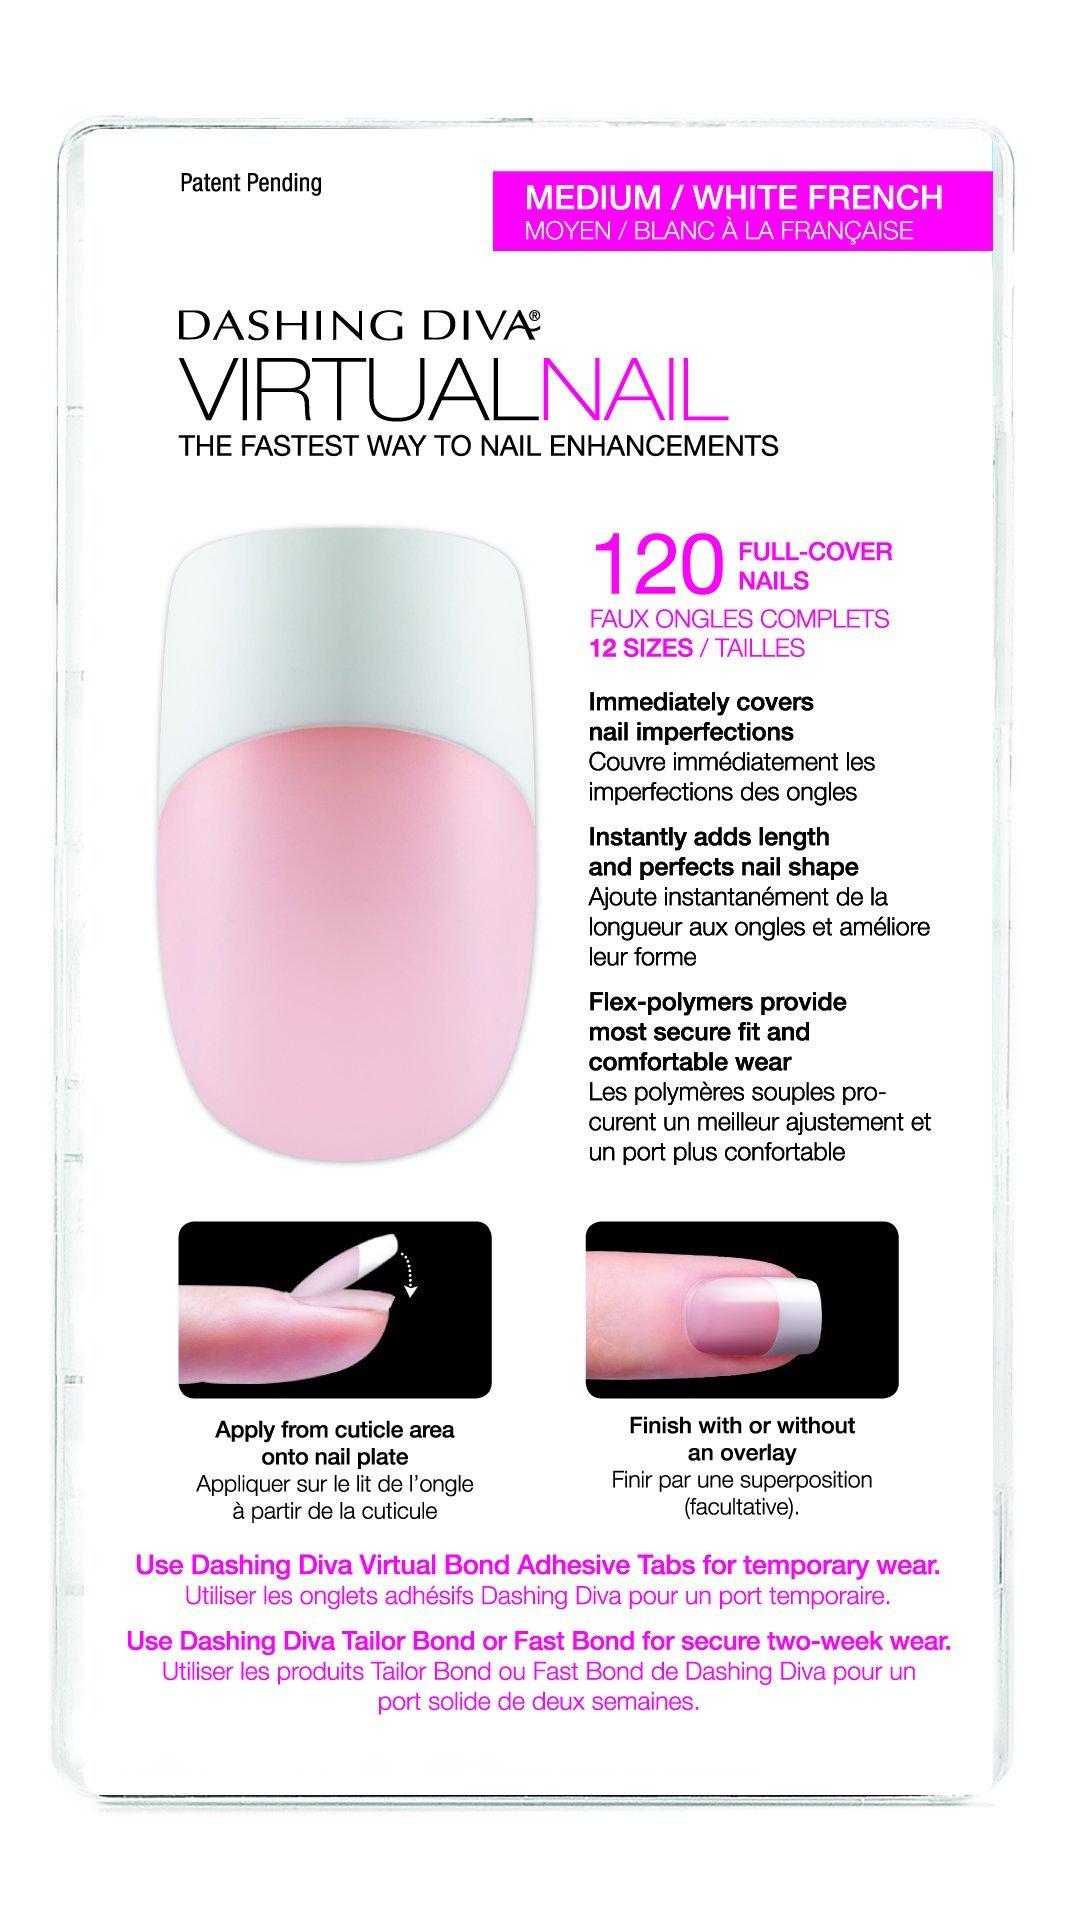 Dashing diva virtual nails clear 120 count false nails beauty - Diva nails and beauty ...